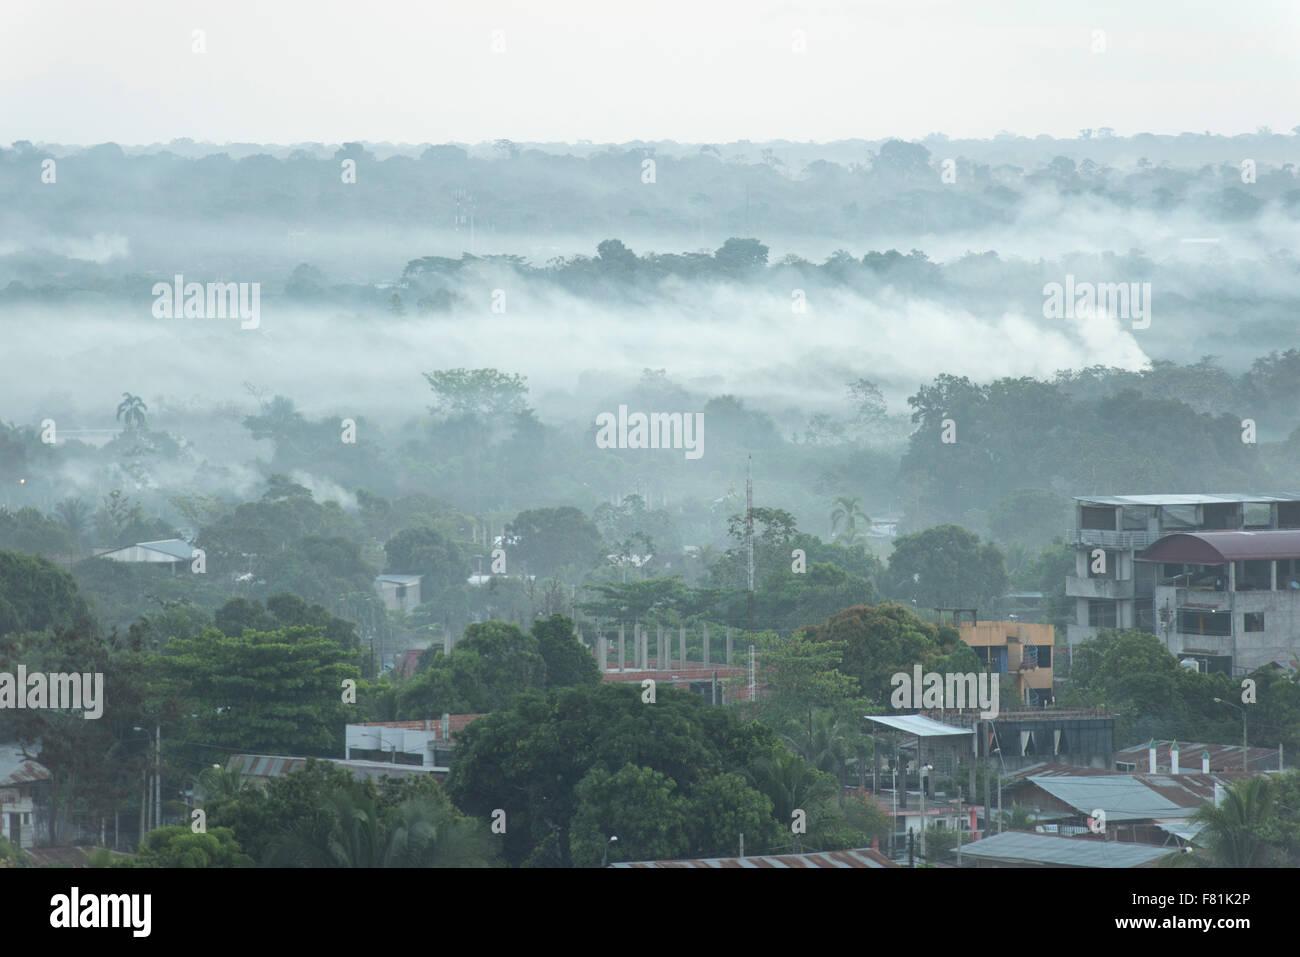 Rauch Haze von El Niño verbundenen Brände in Amazonien 2015, Puerto Maldonado, Madre De Dios, Peru Stockbild